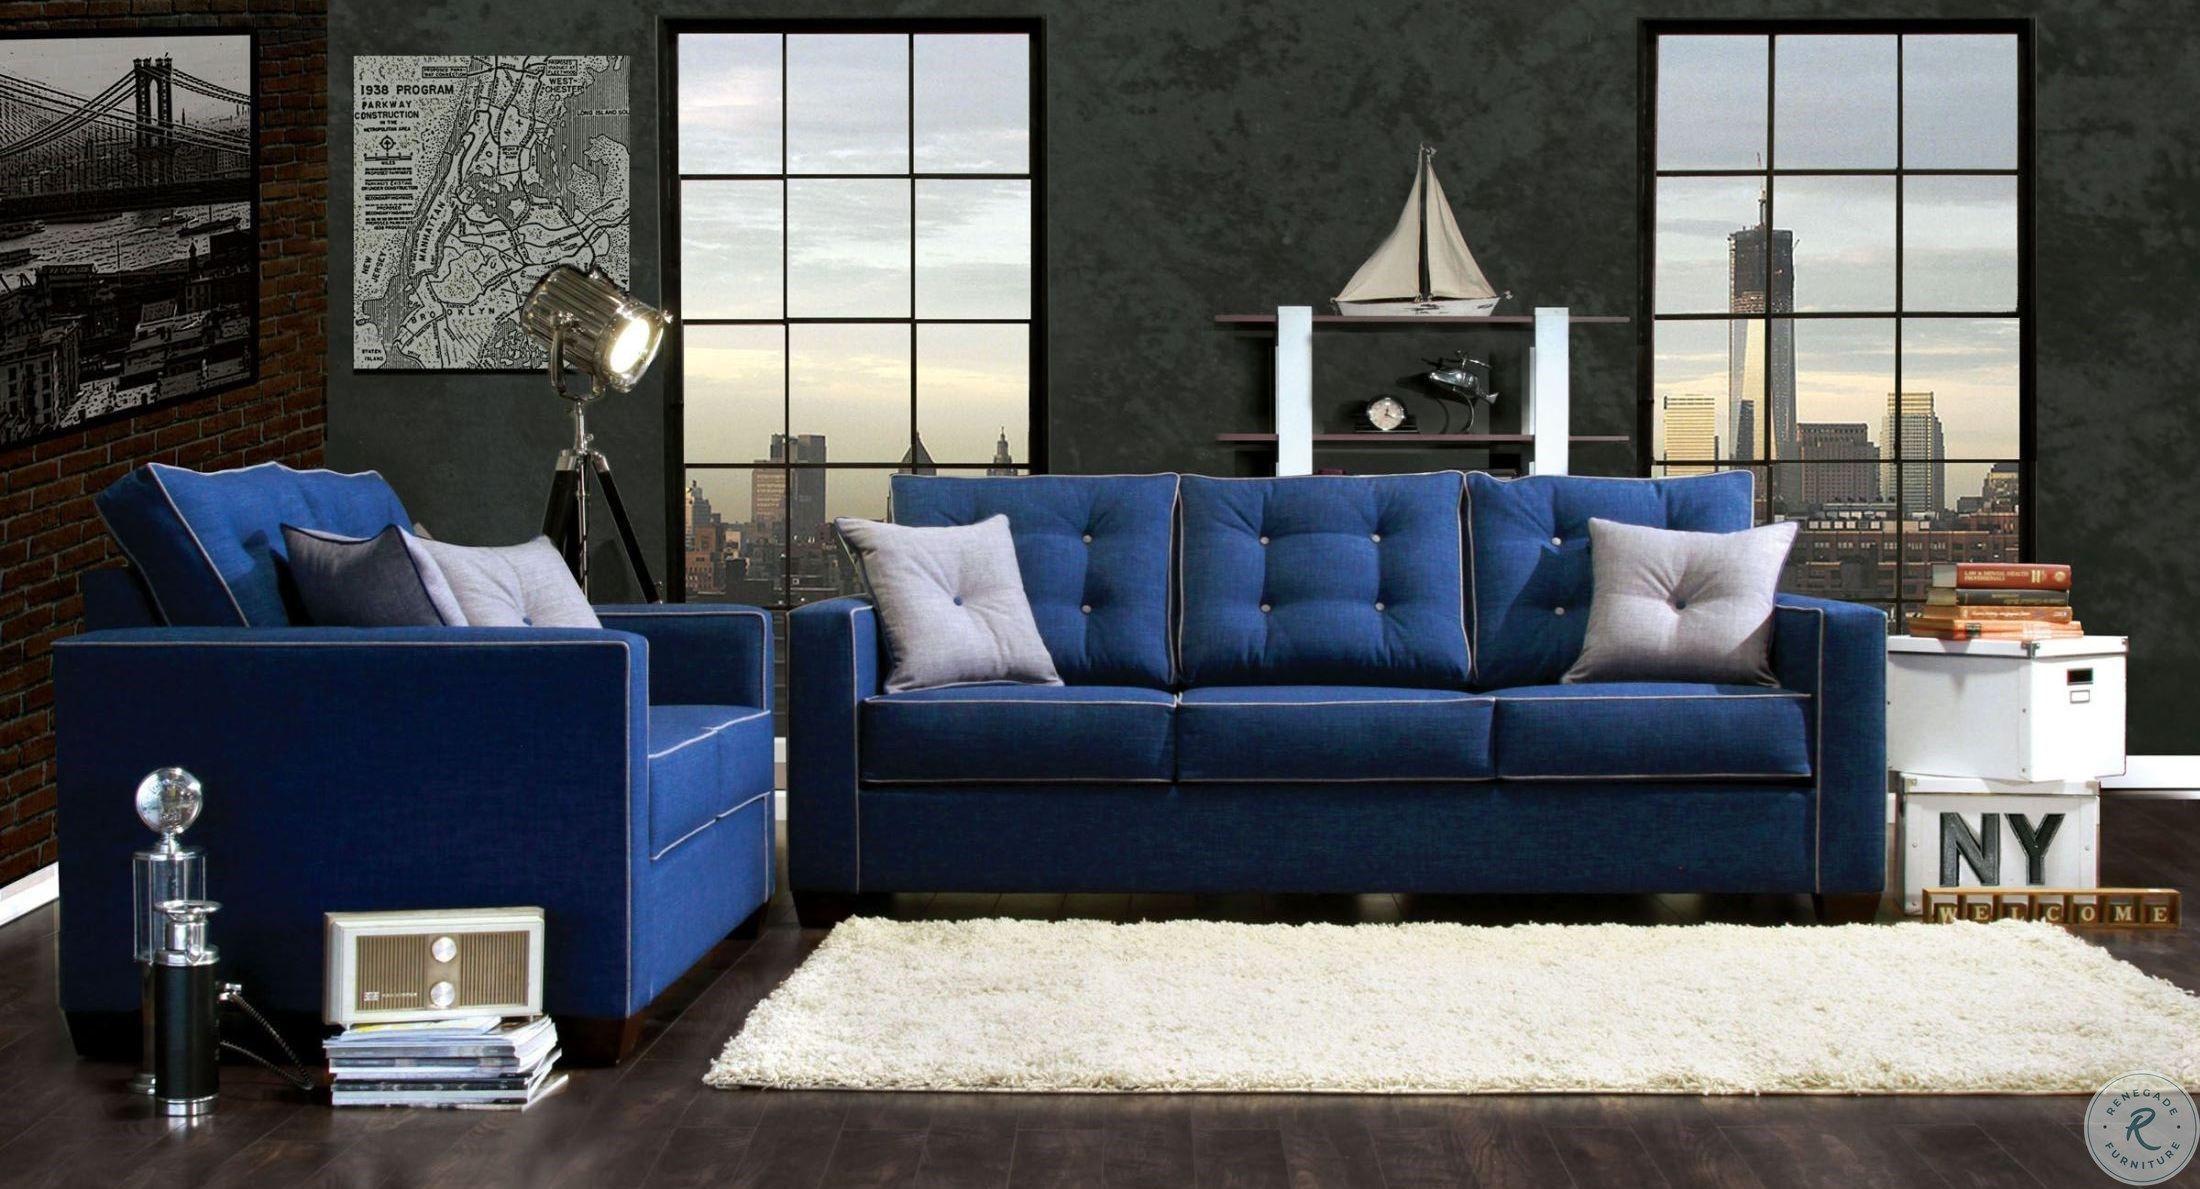 Ravel I Blue Fabric Living Room Set Foa Sm8802 Sf Room Blue Sofas Living Room White Living Room Set Blue Furniture Living Room